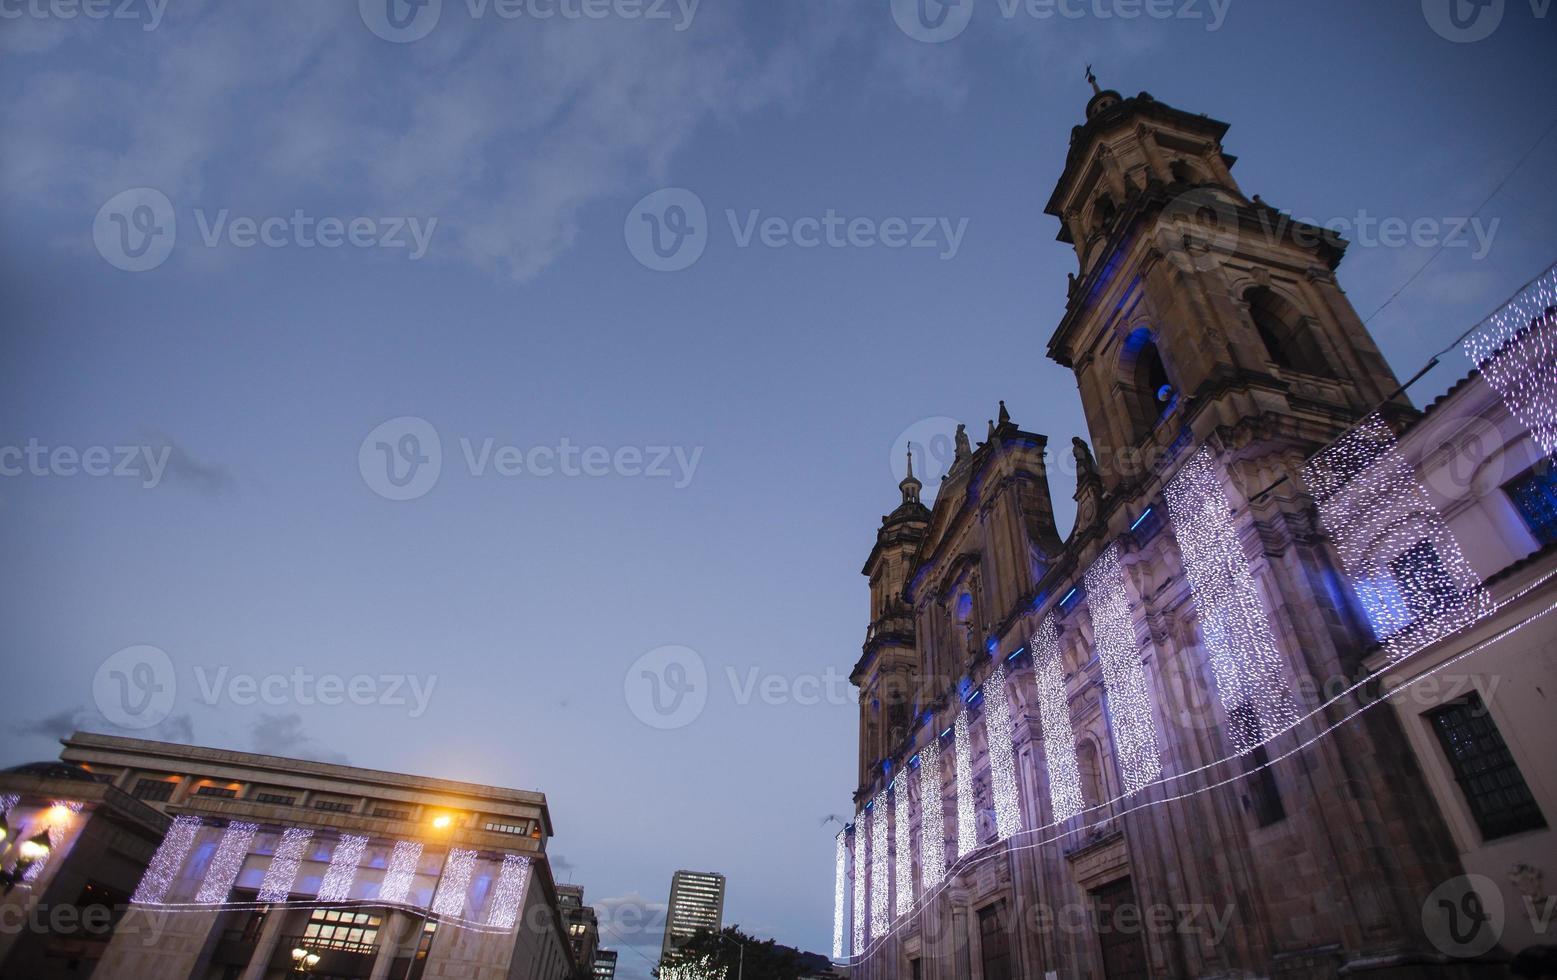 bogota kathedraal gevel nacht foto